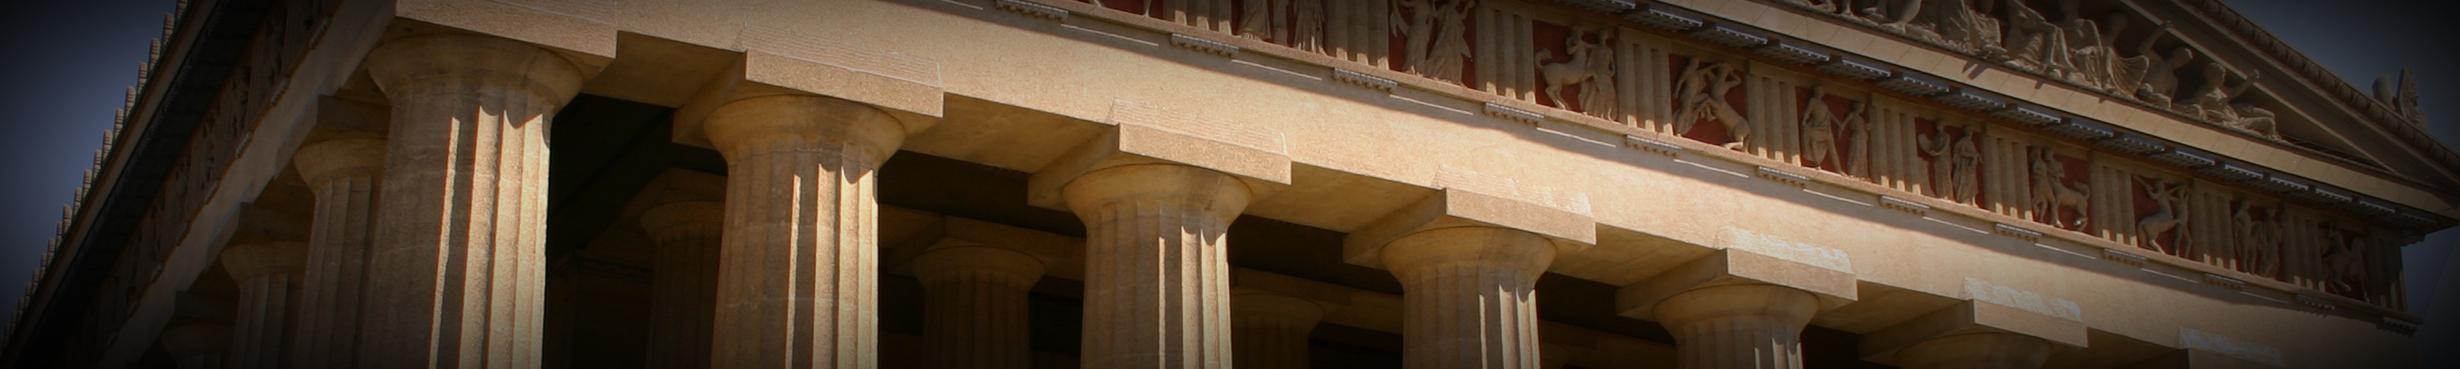 Pillars 2.jpg